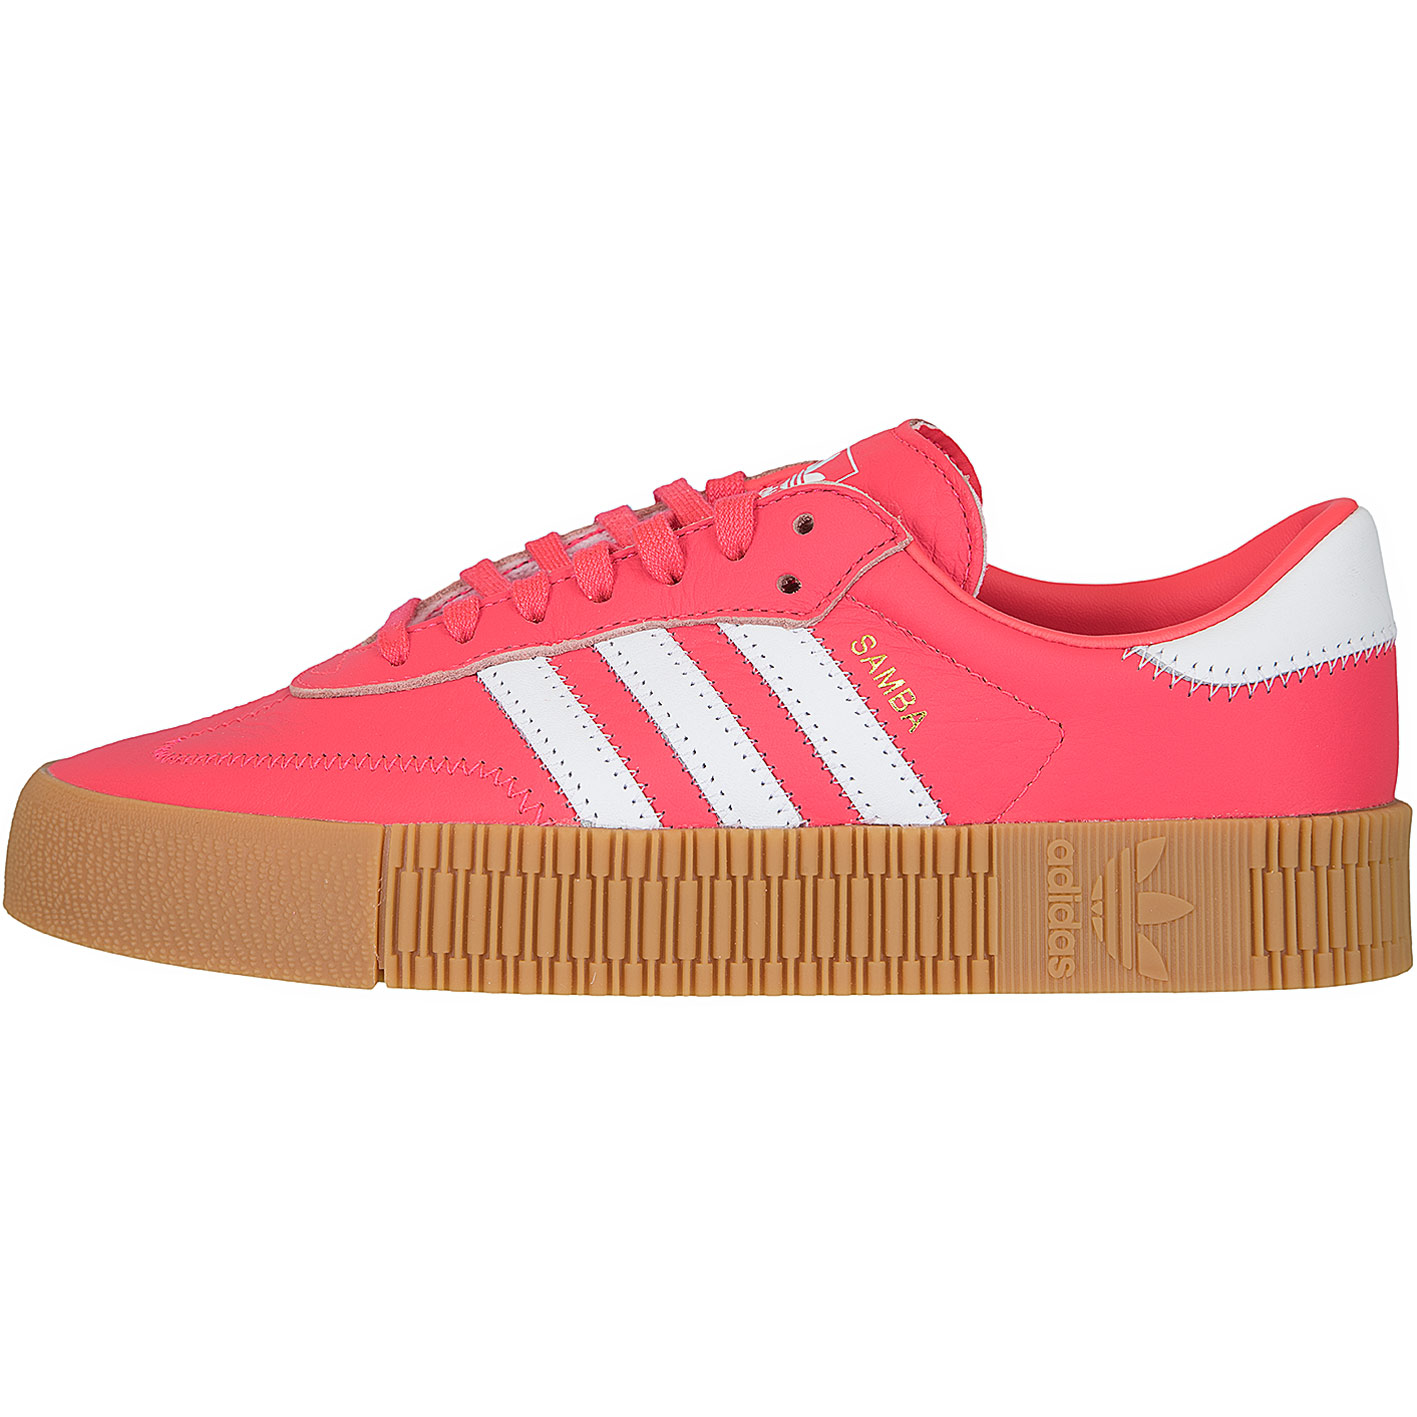 sale usa online new photos the best attitude Adidas Originals Damen Sneaker Sambarose rot/weiß